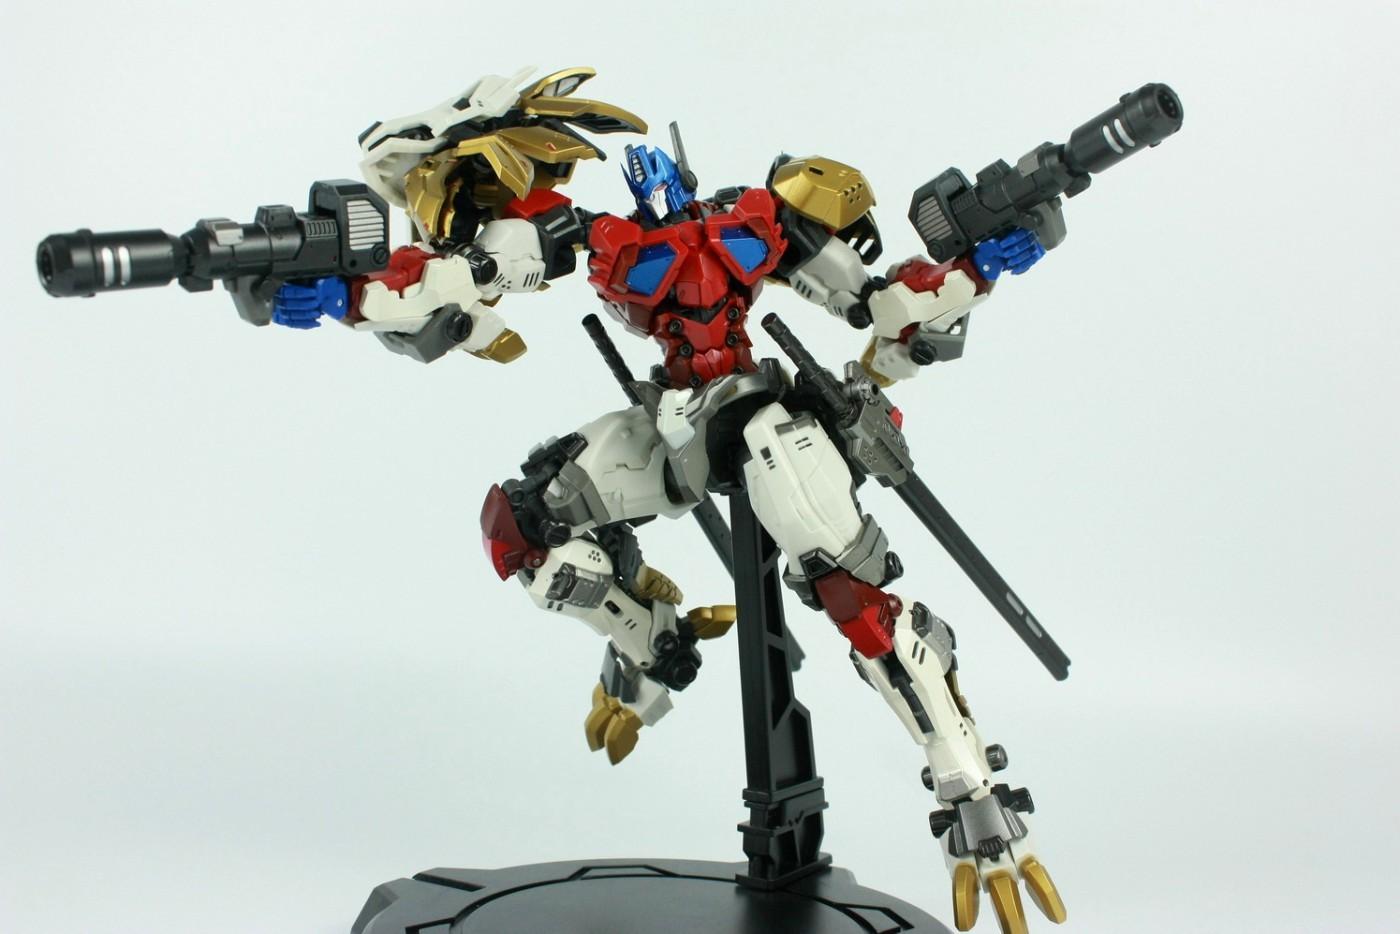 S193_Neoart_optimus_prime_review_info_inask_090.jpg